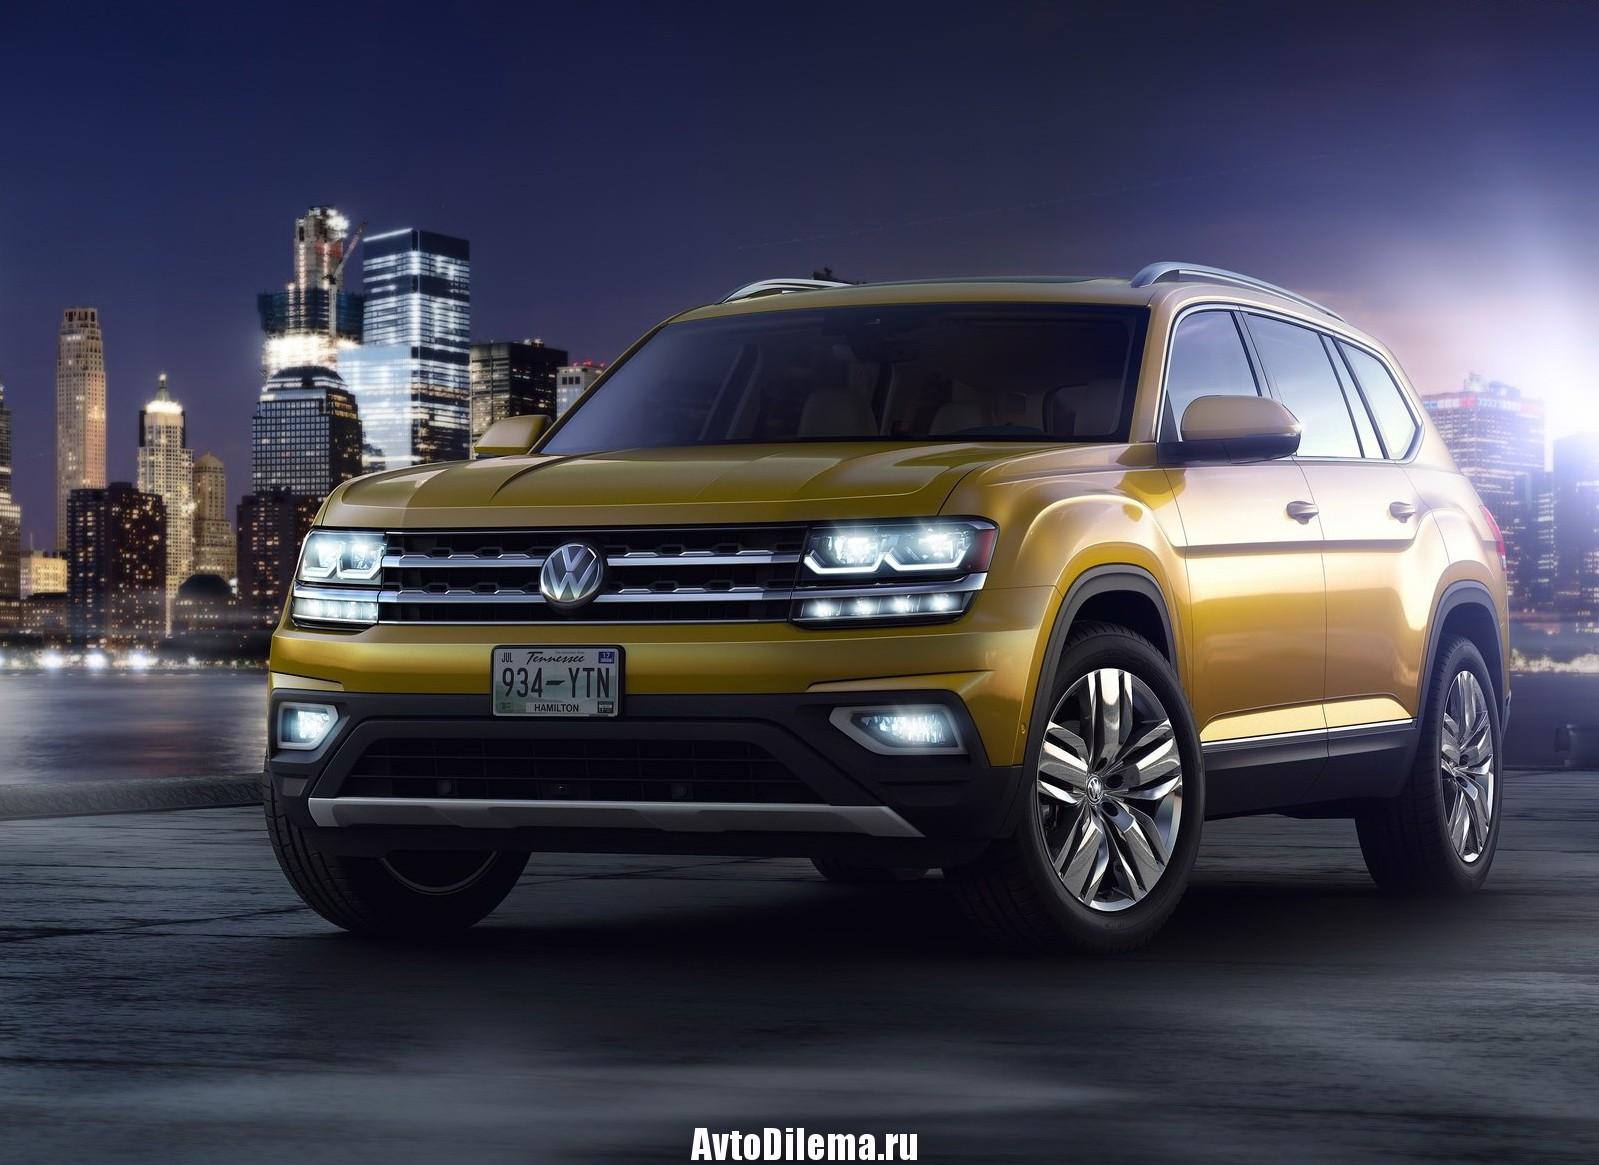 Новый Volkswagen Teramont (Atlas).